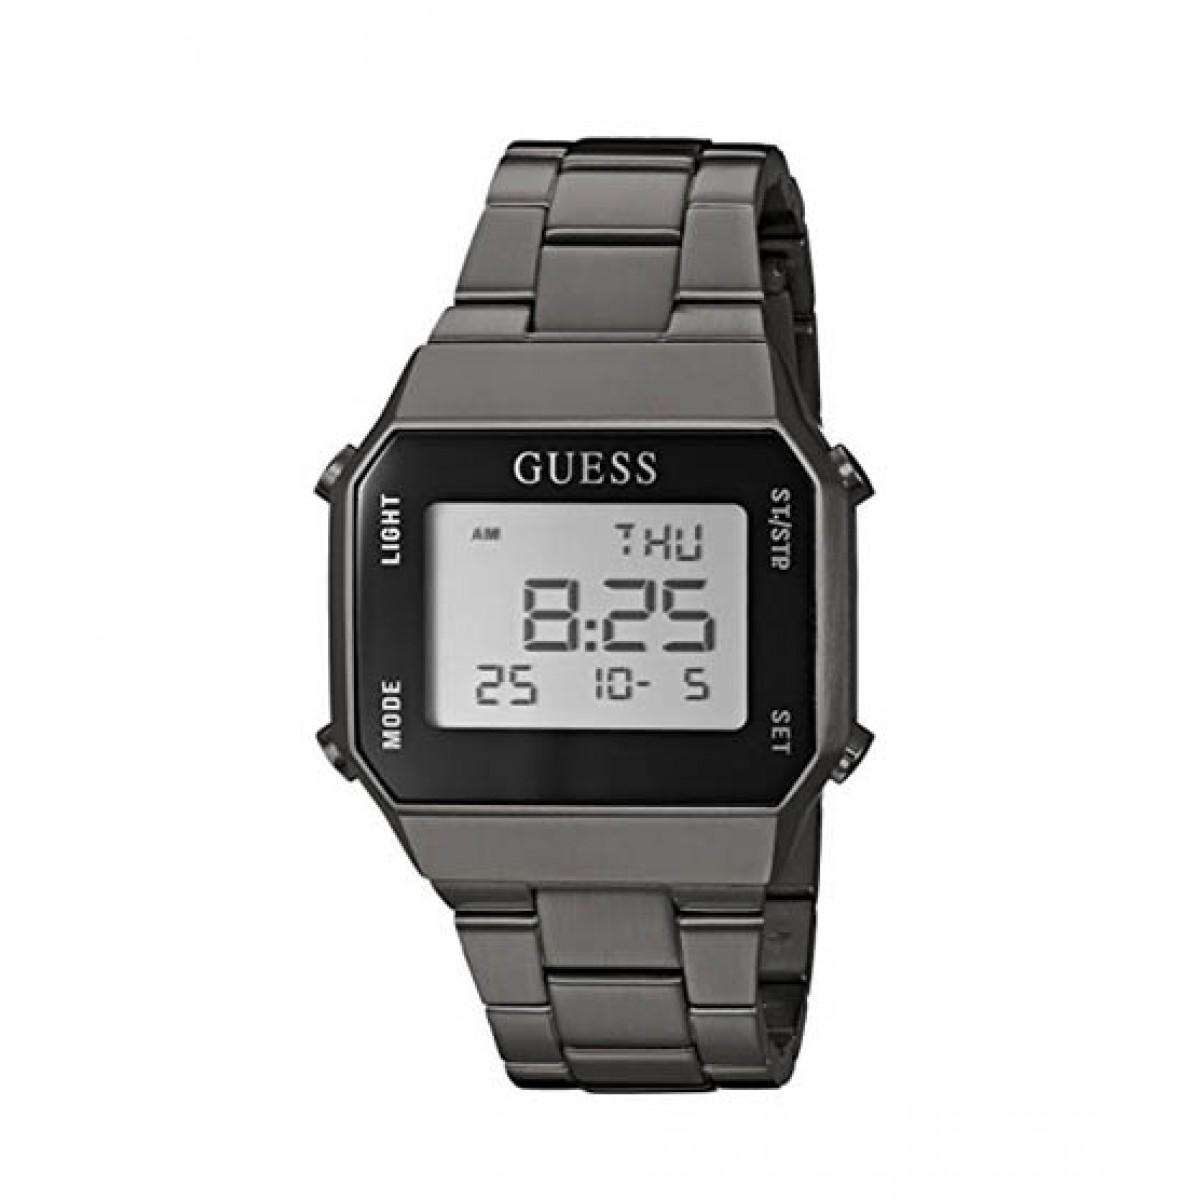 Guess Digital Quartz Men s Watch Price in Pakistan  21ff8a8162